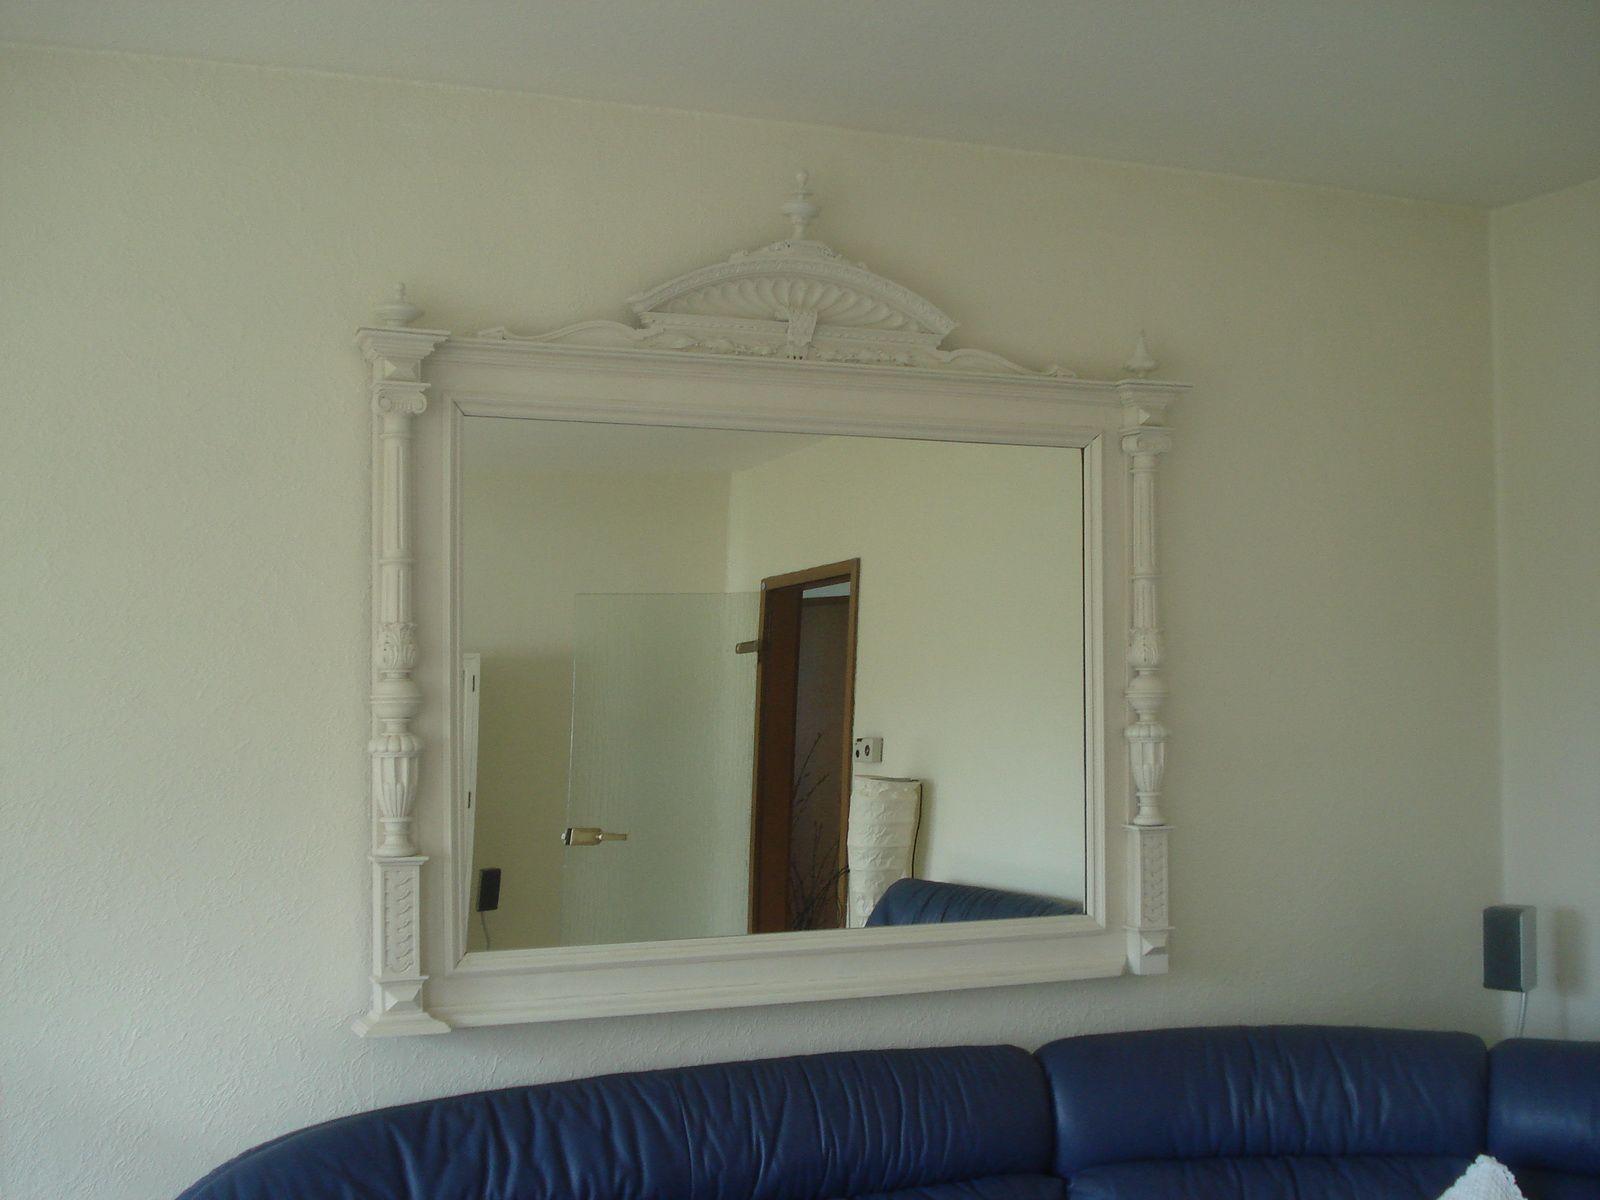 spiegel rahmen im shabby look bauanleitung zum selber. Black Bedroom Furniture Sets. Home Design Ideas